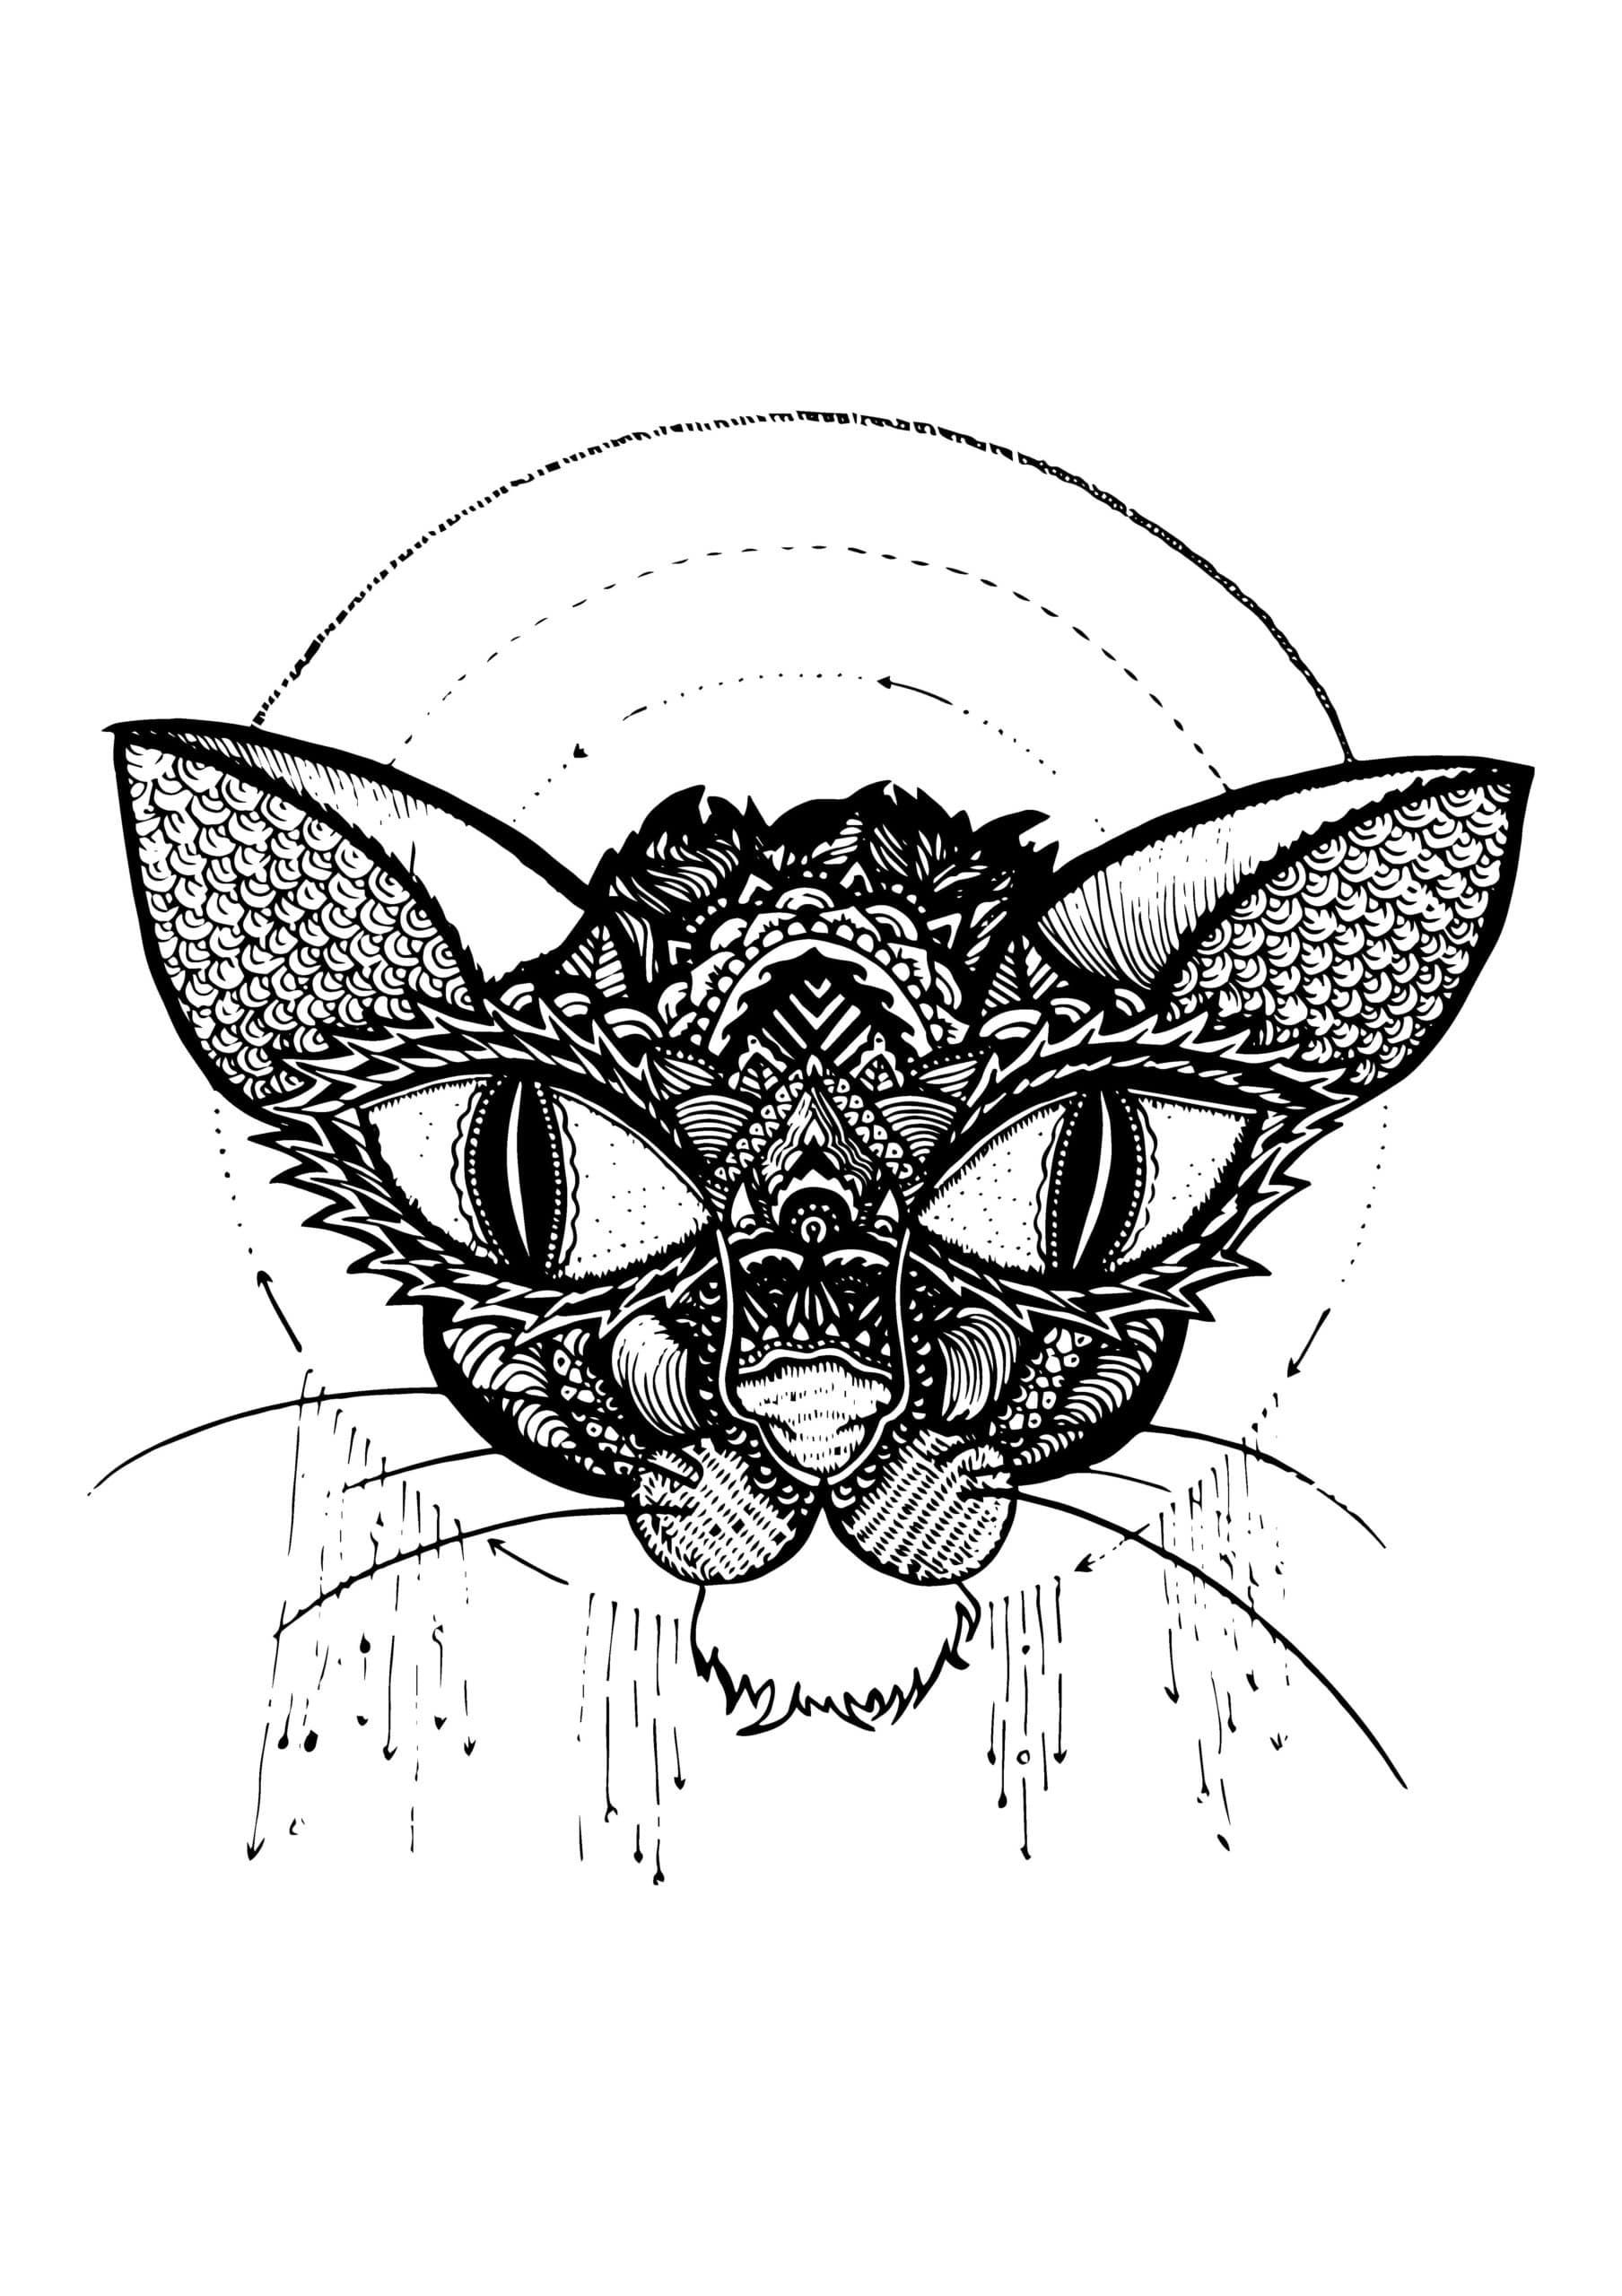 Illustration Le chat